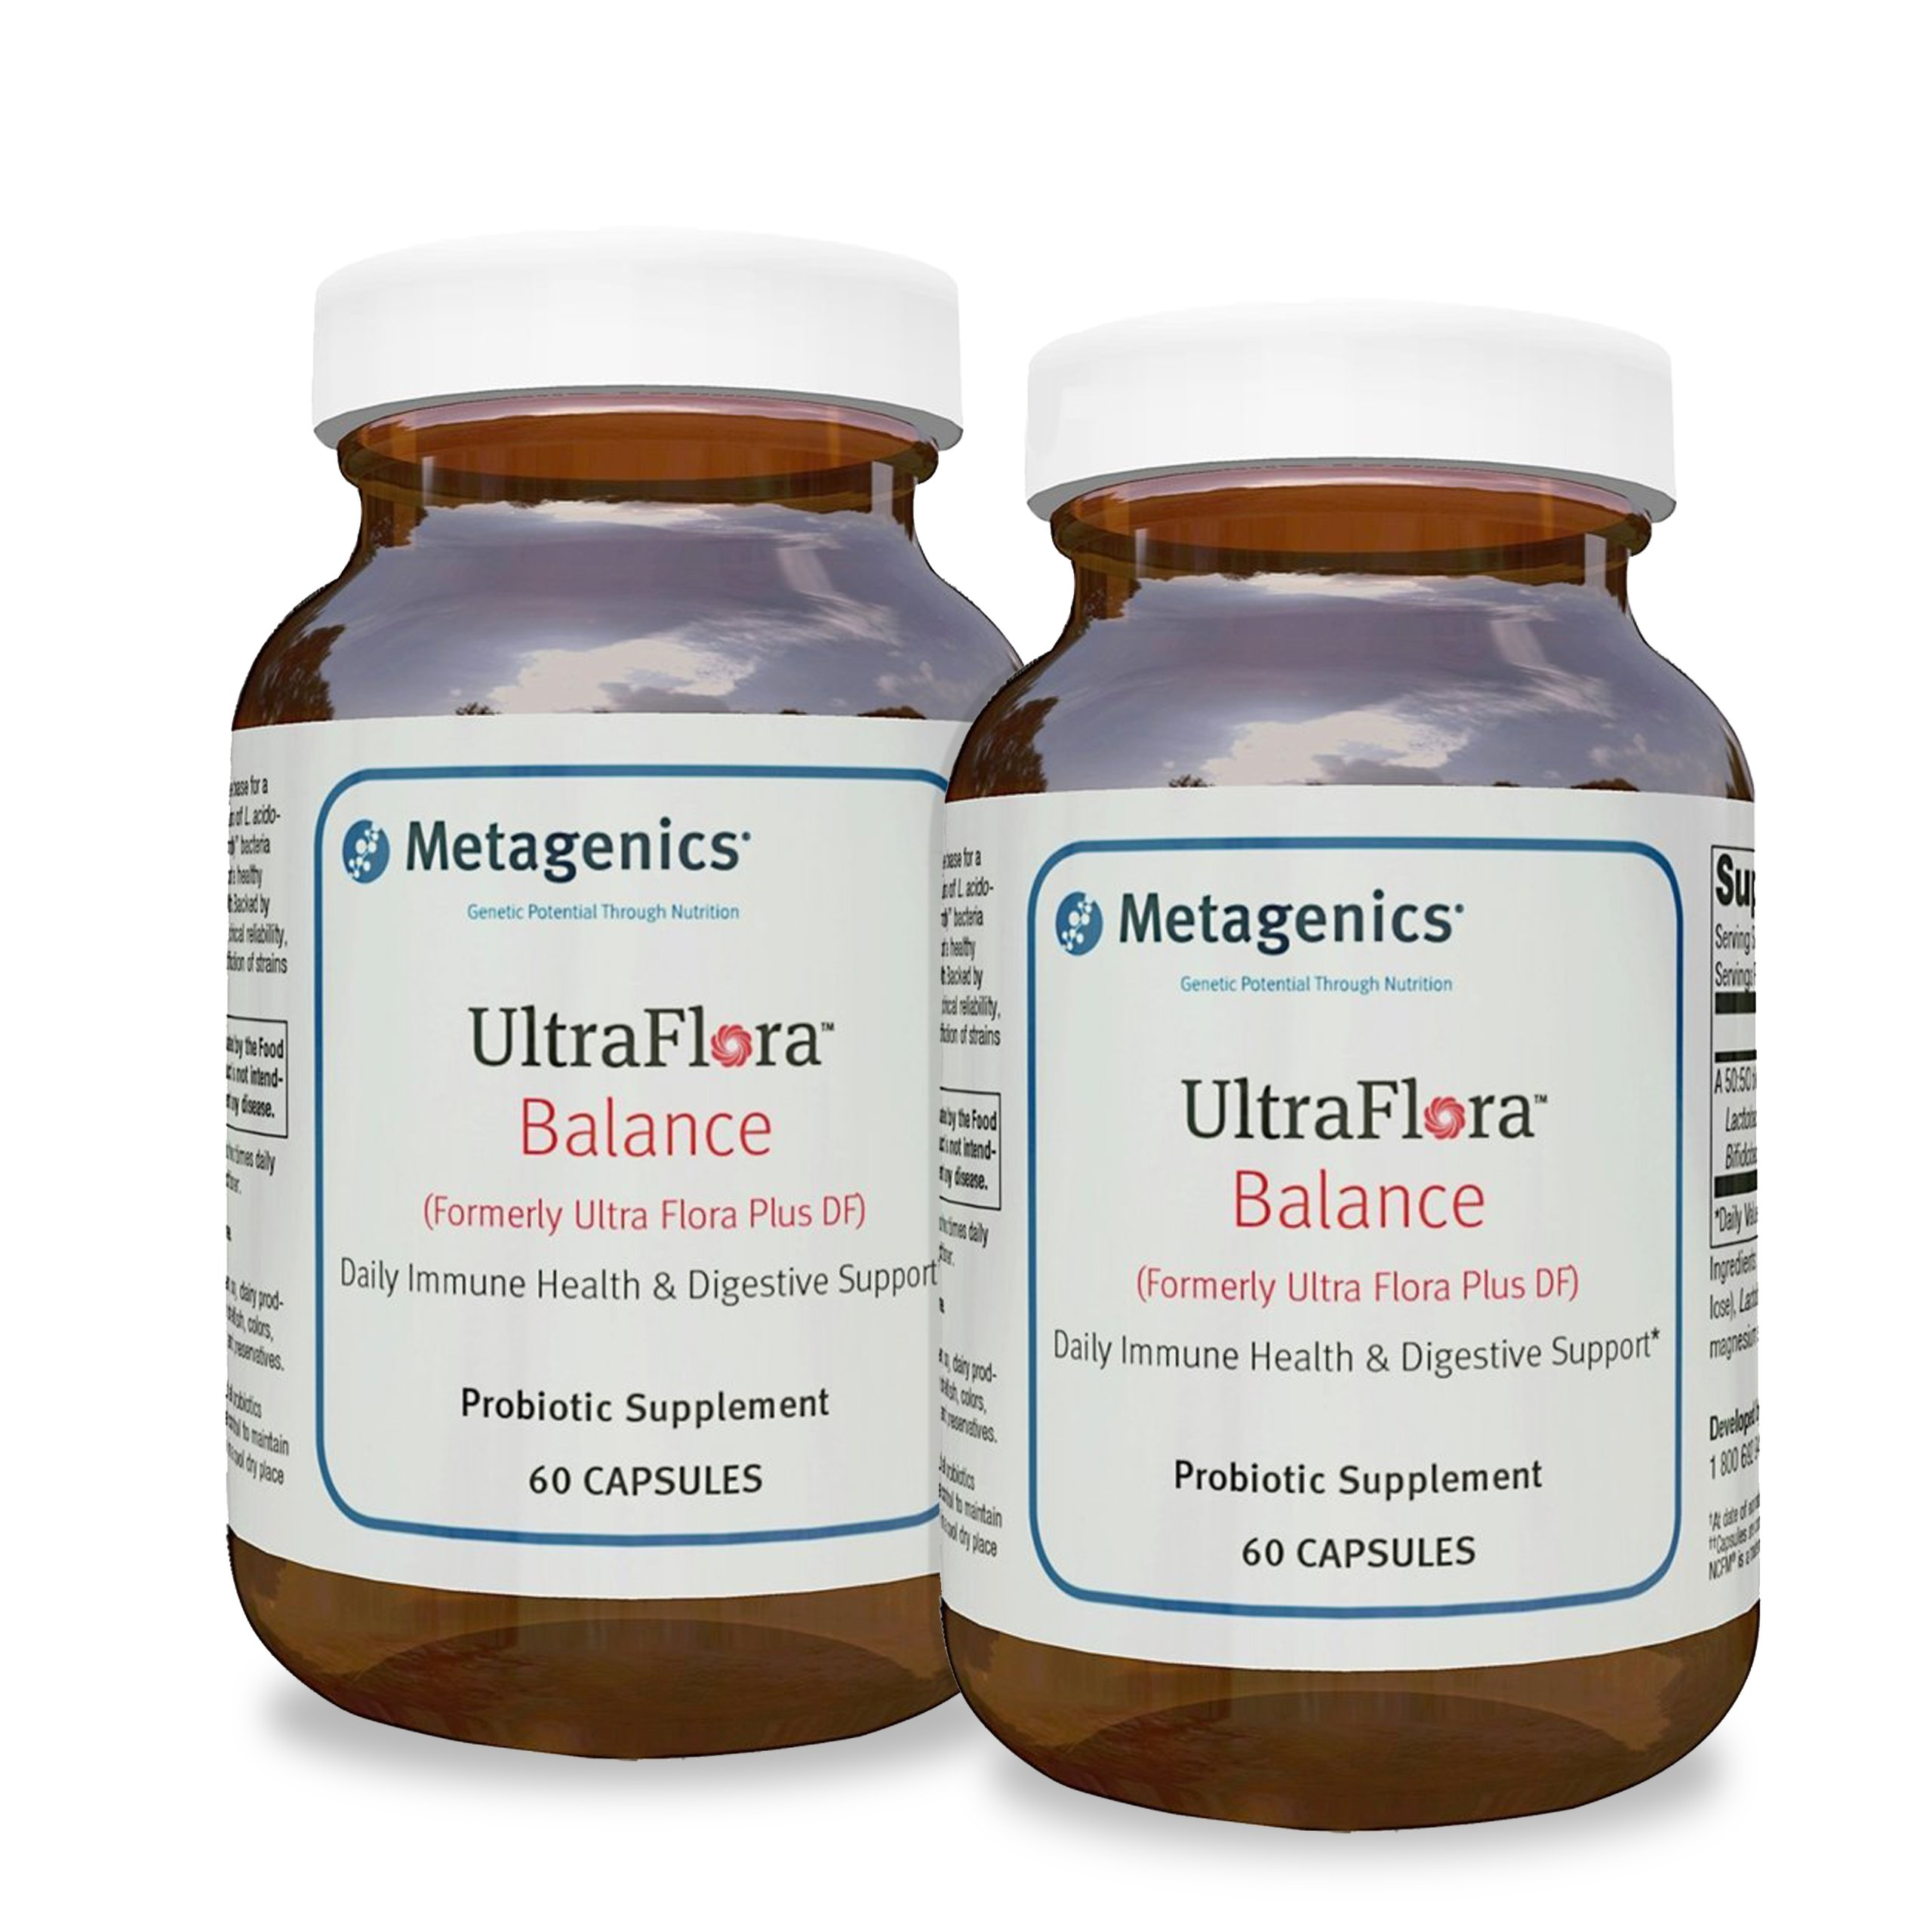 UltraFlora Balance (Formerly Ultra Flora DF) - Probiotic Supplement, 2 Pack, 60 Capsules Each Bottle